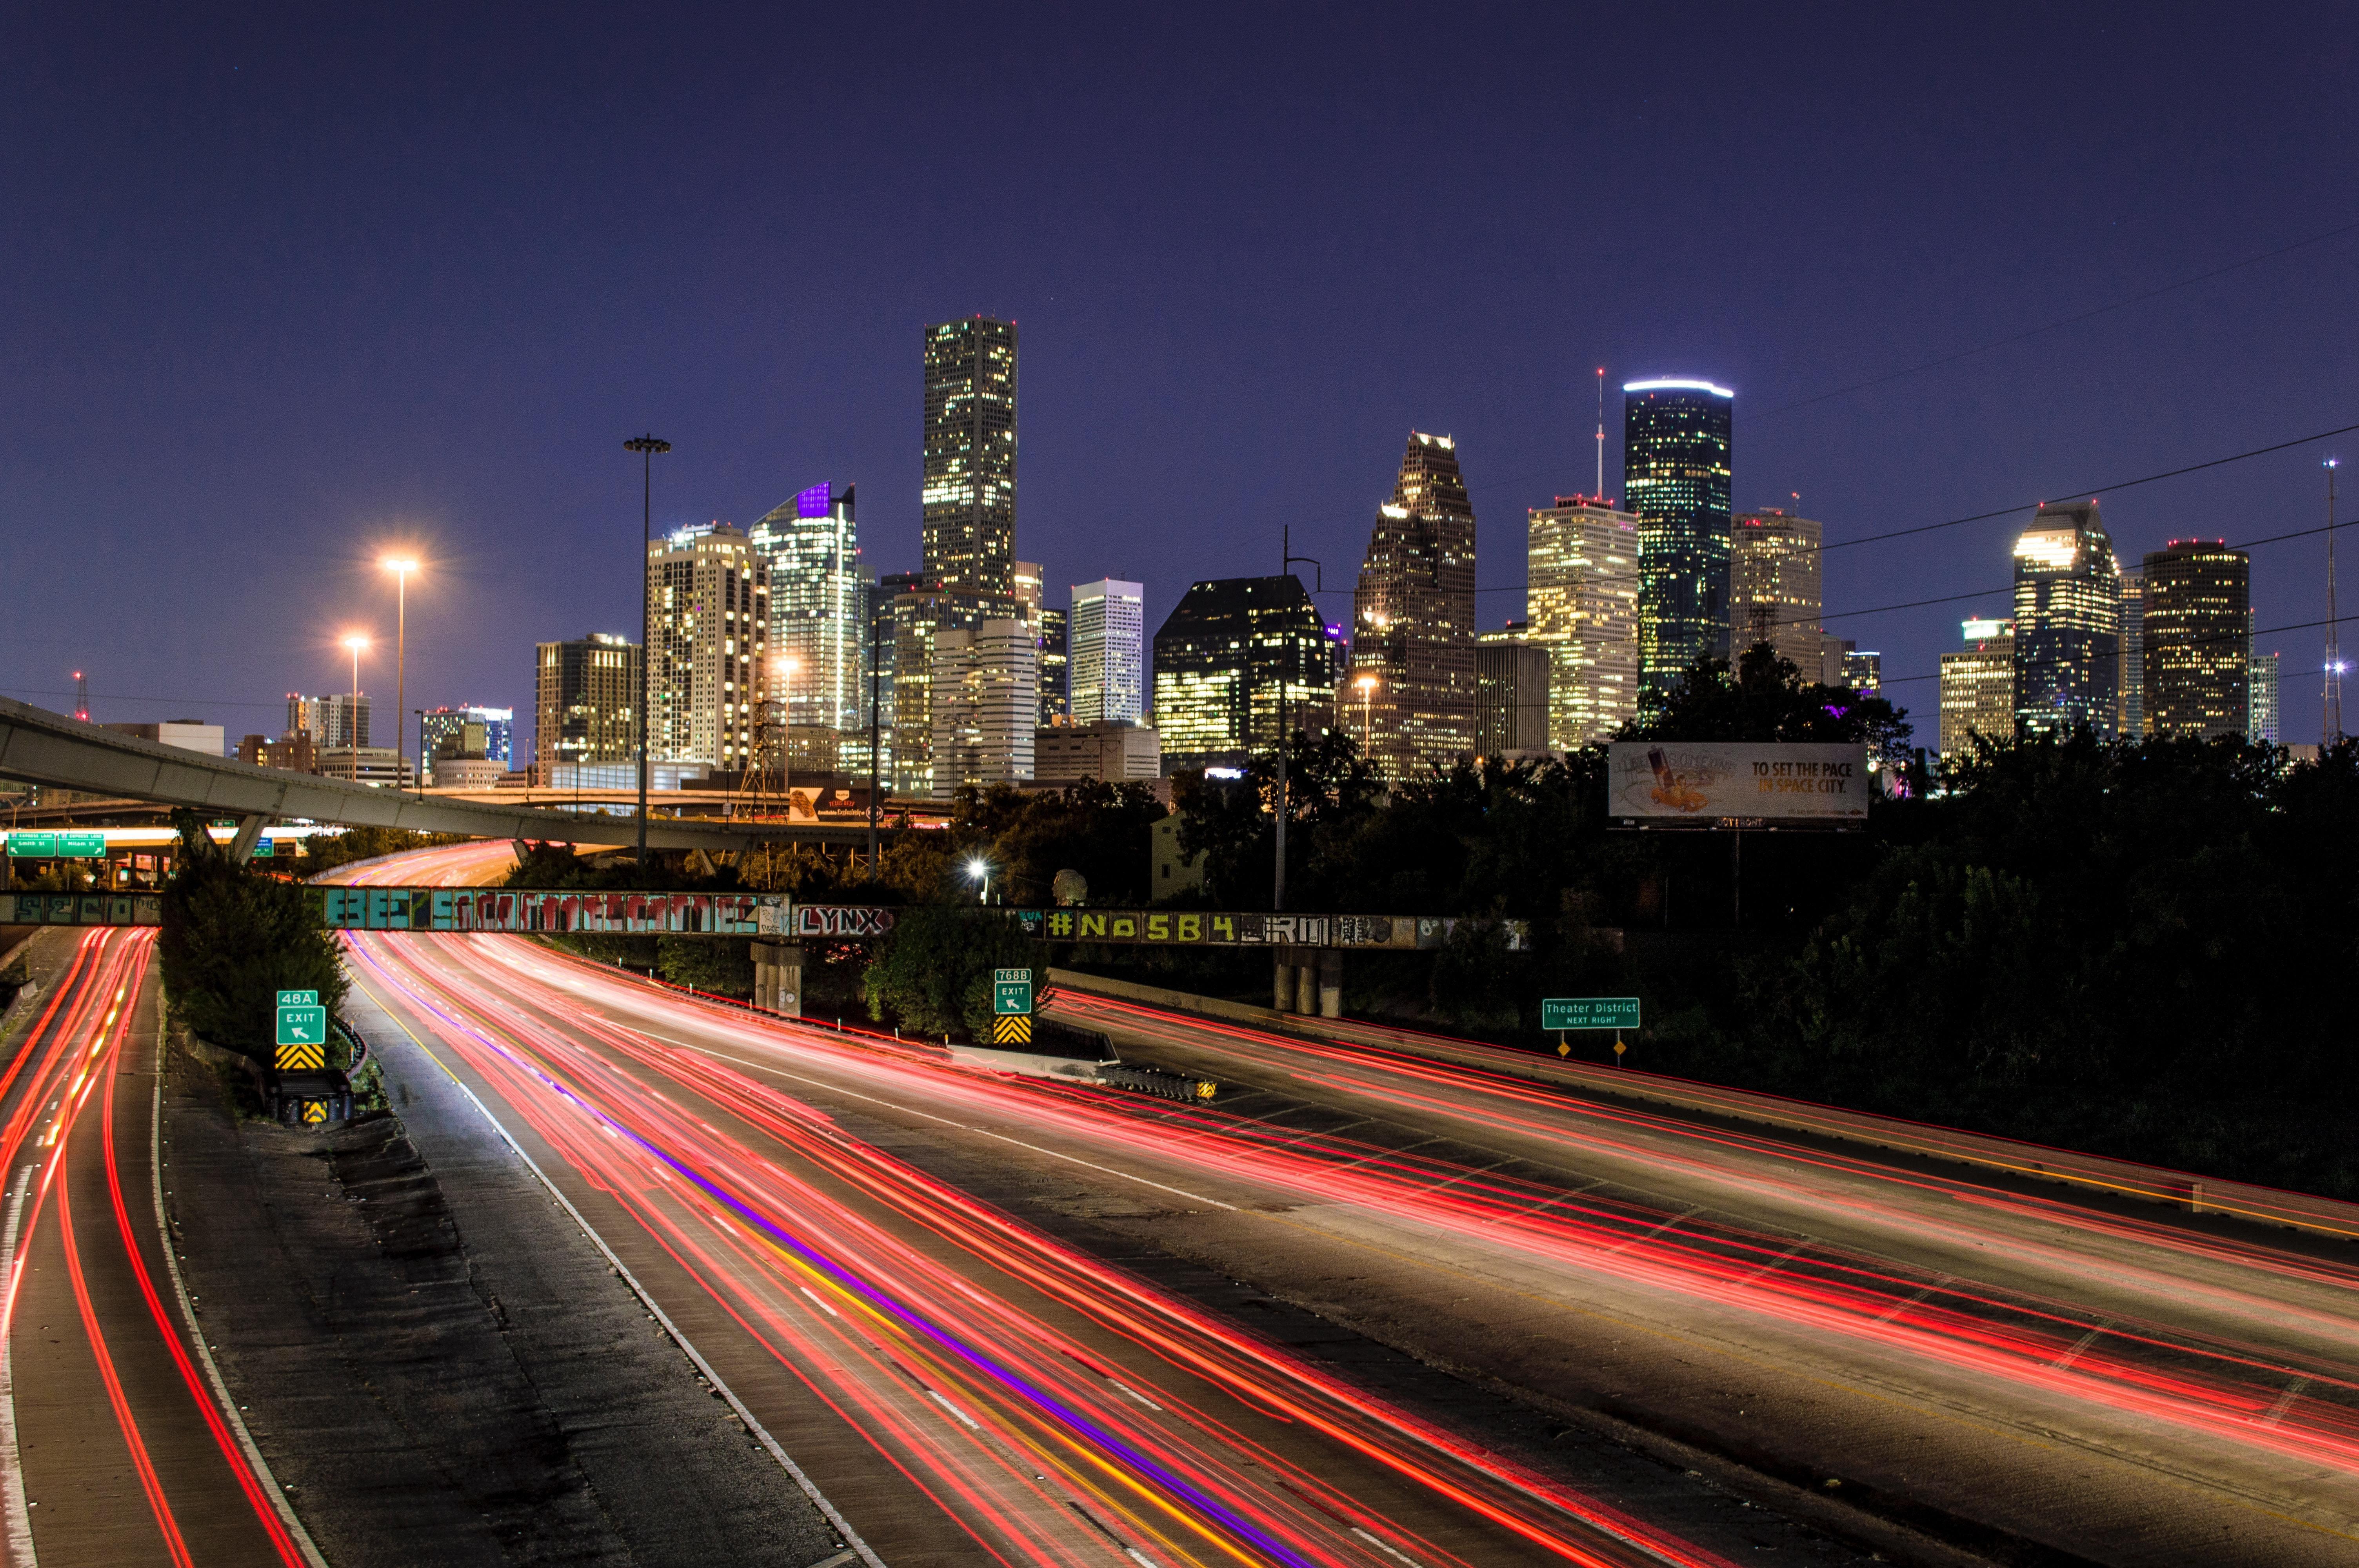 image of Houston city in Texas